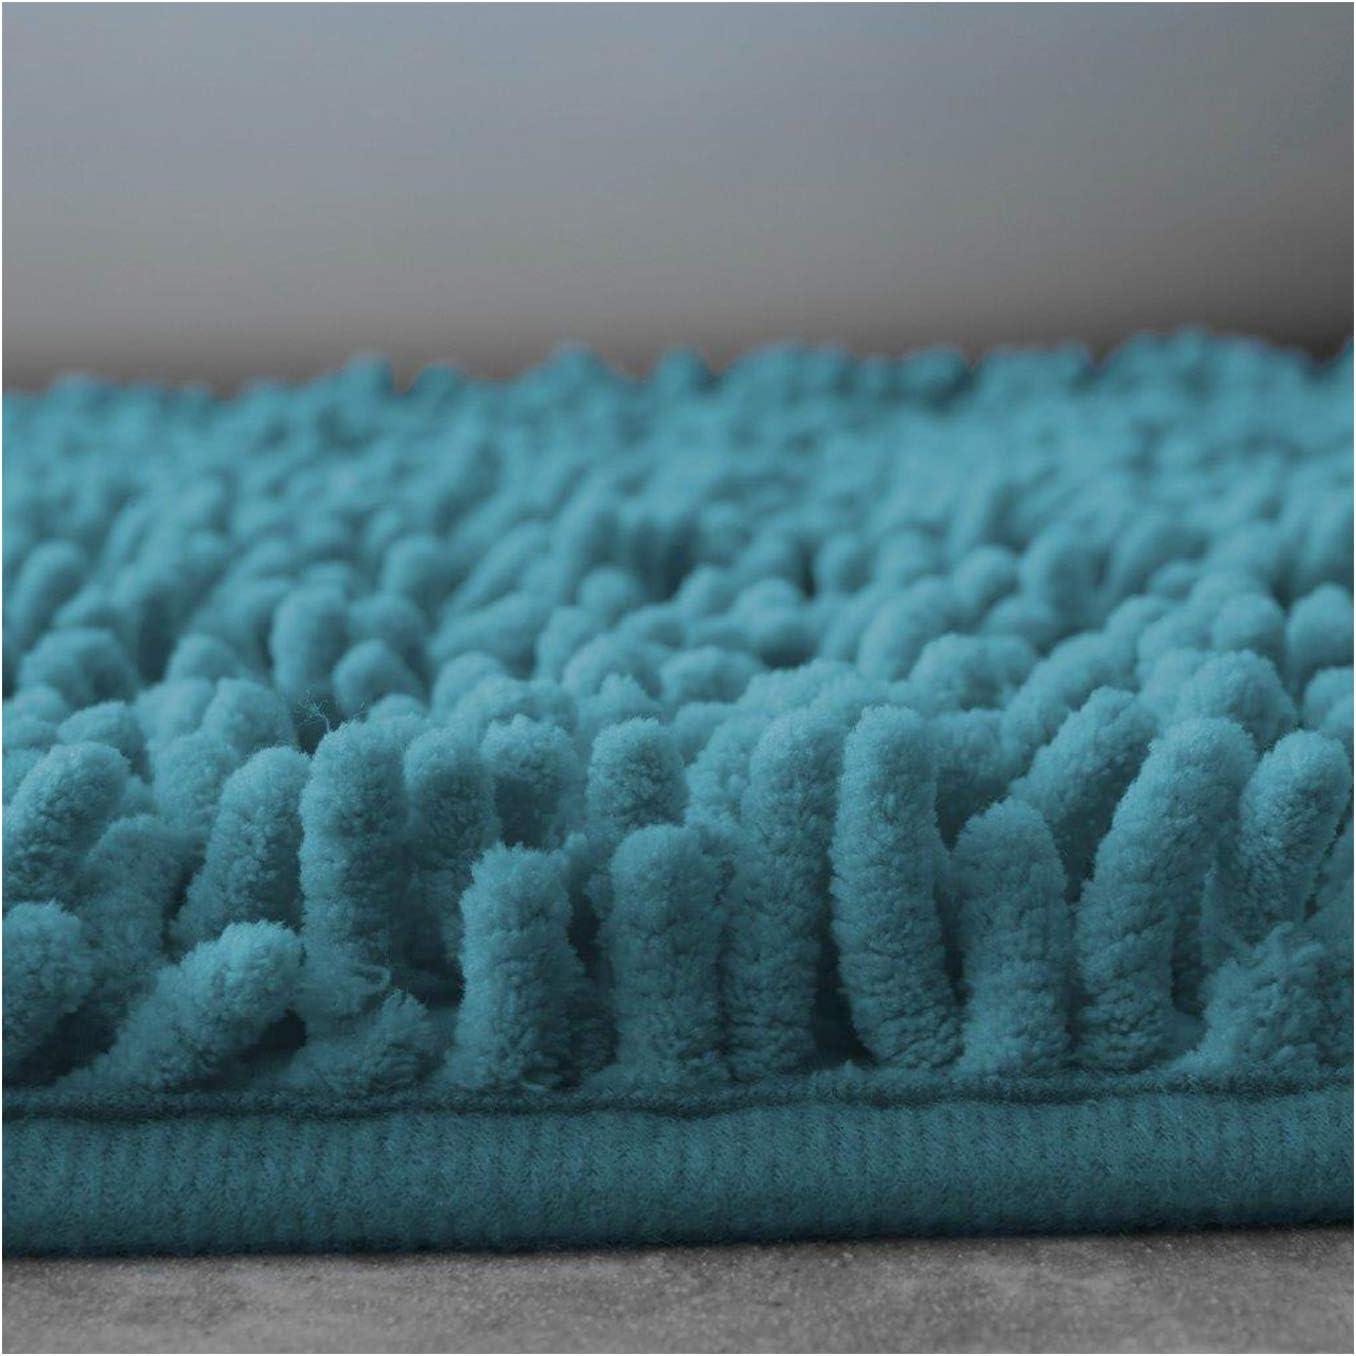 Non Slip Soft Chenille Bath Mats Slip Resistant Plush Bath Mats for Toilet Shower Bathroom Water Absorbent Shaggy Bath Rugs FAIRWAYUK 2 Piece Bathroom Rugs Set Natural